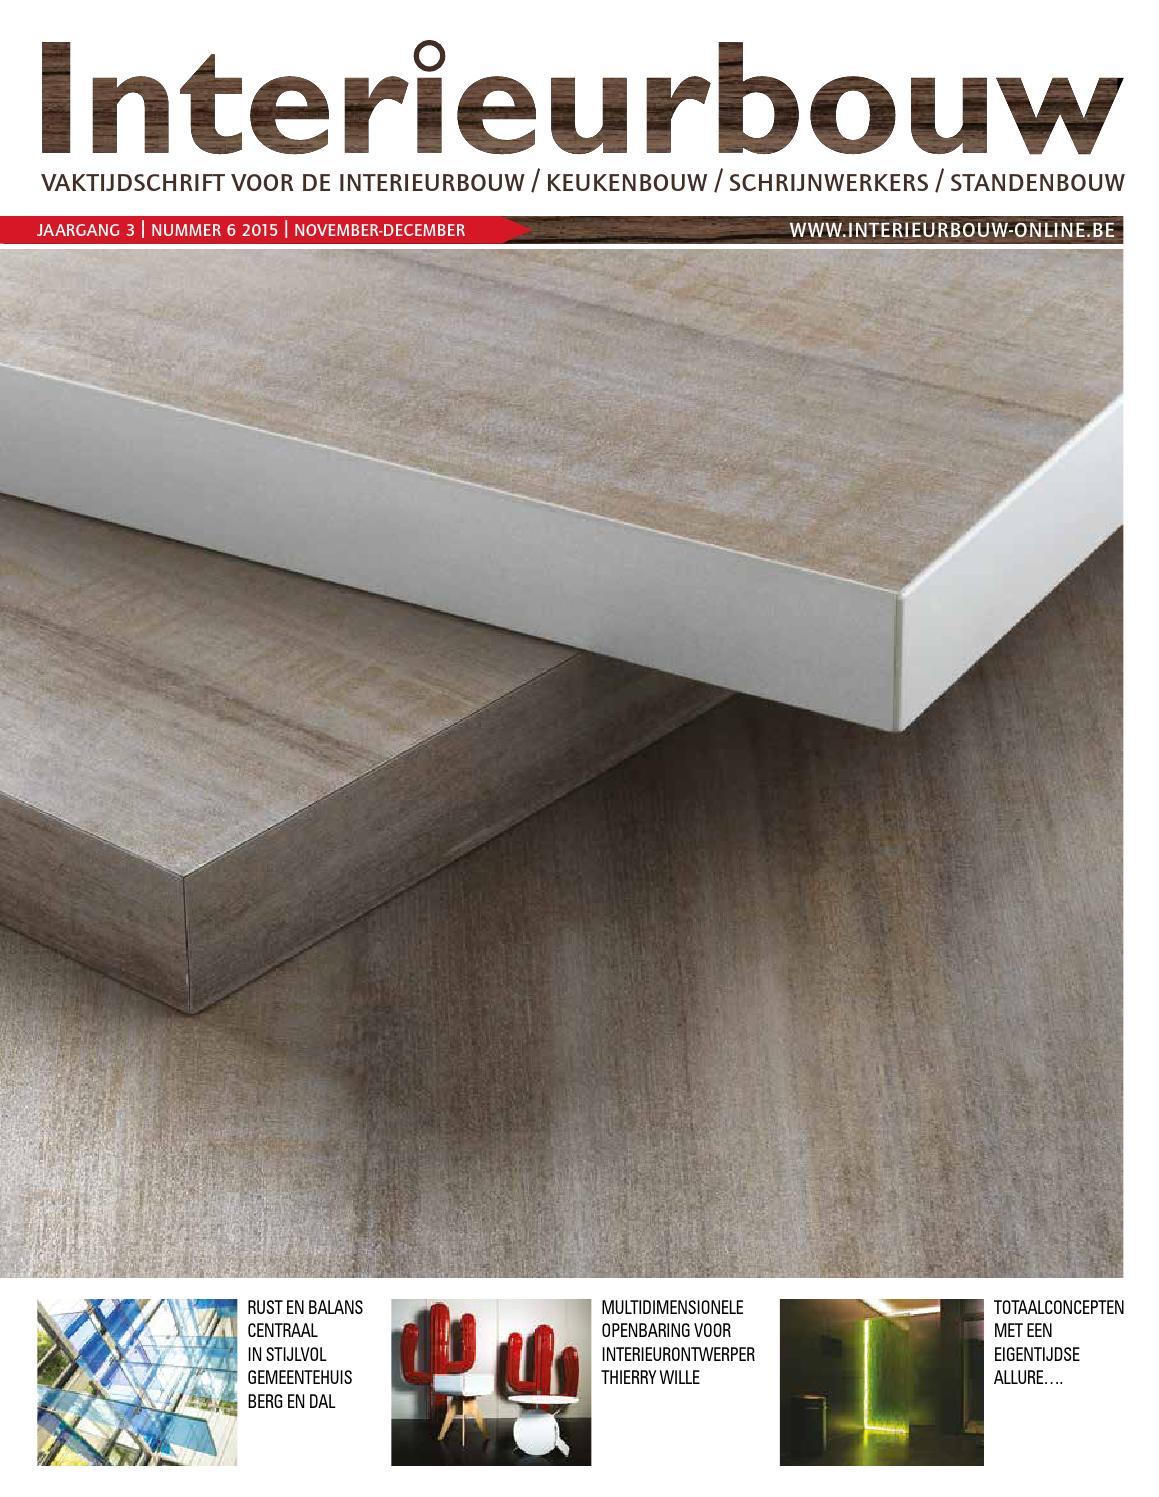 Interieurbouw 06 2015 by louwers uitgeversorganisatie bv   issuu